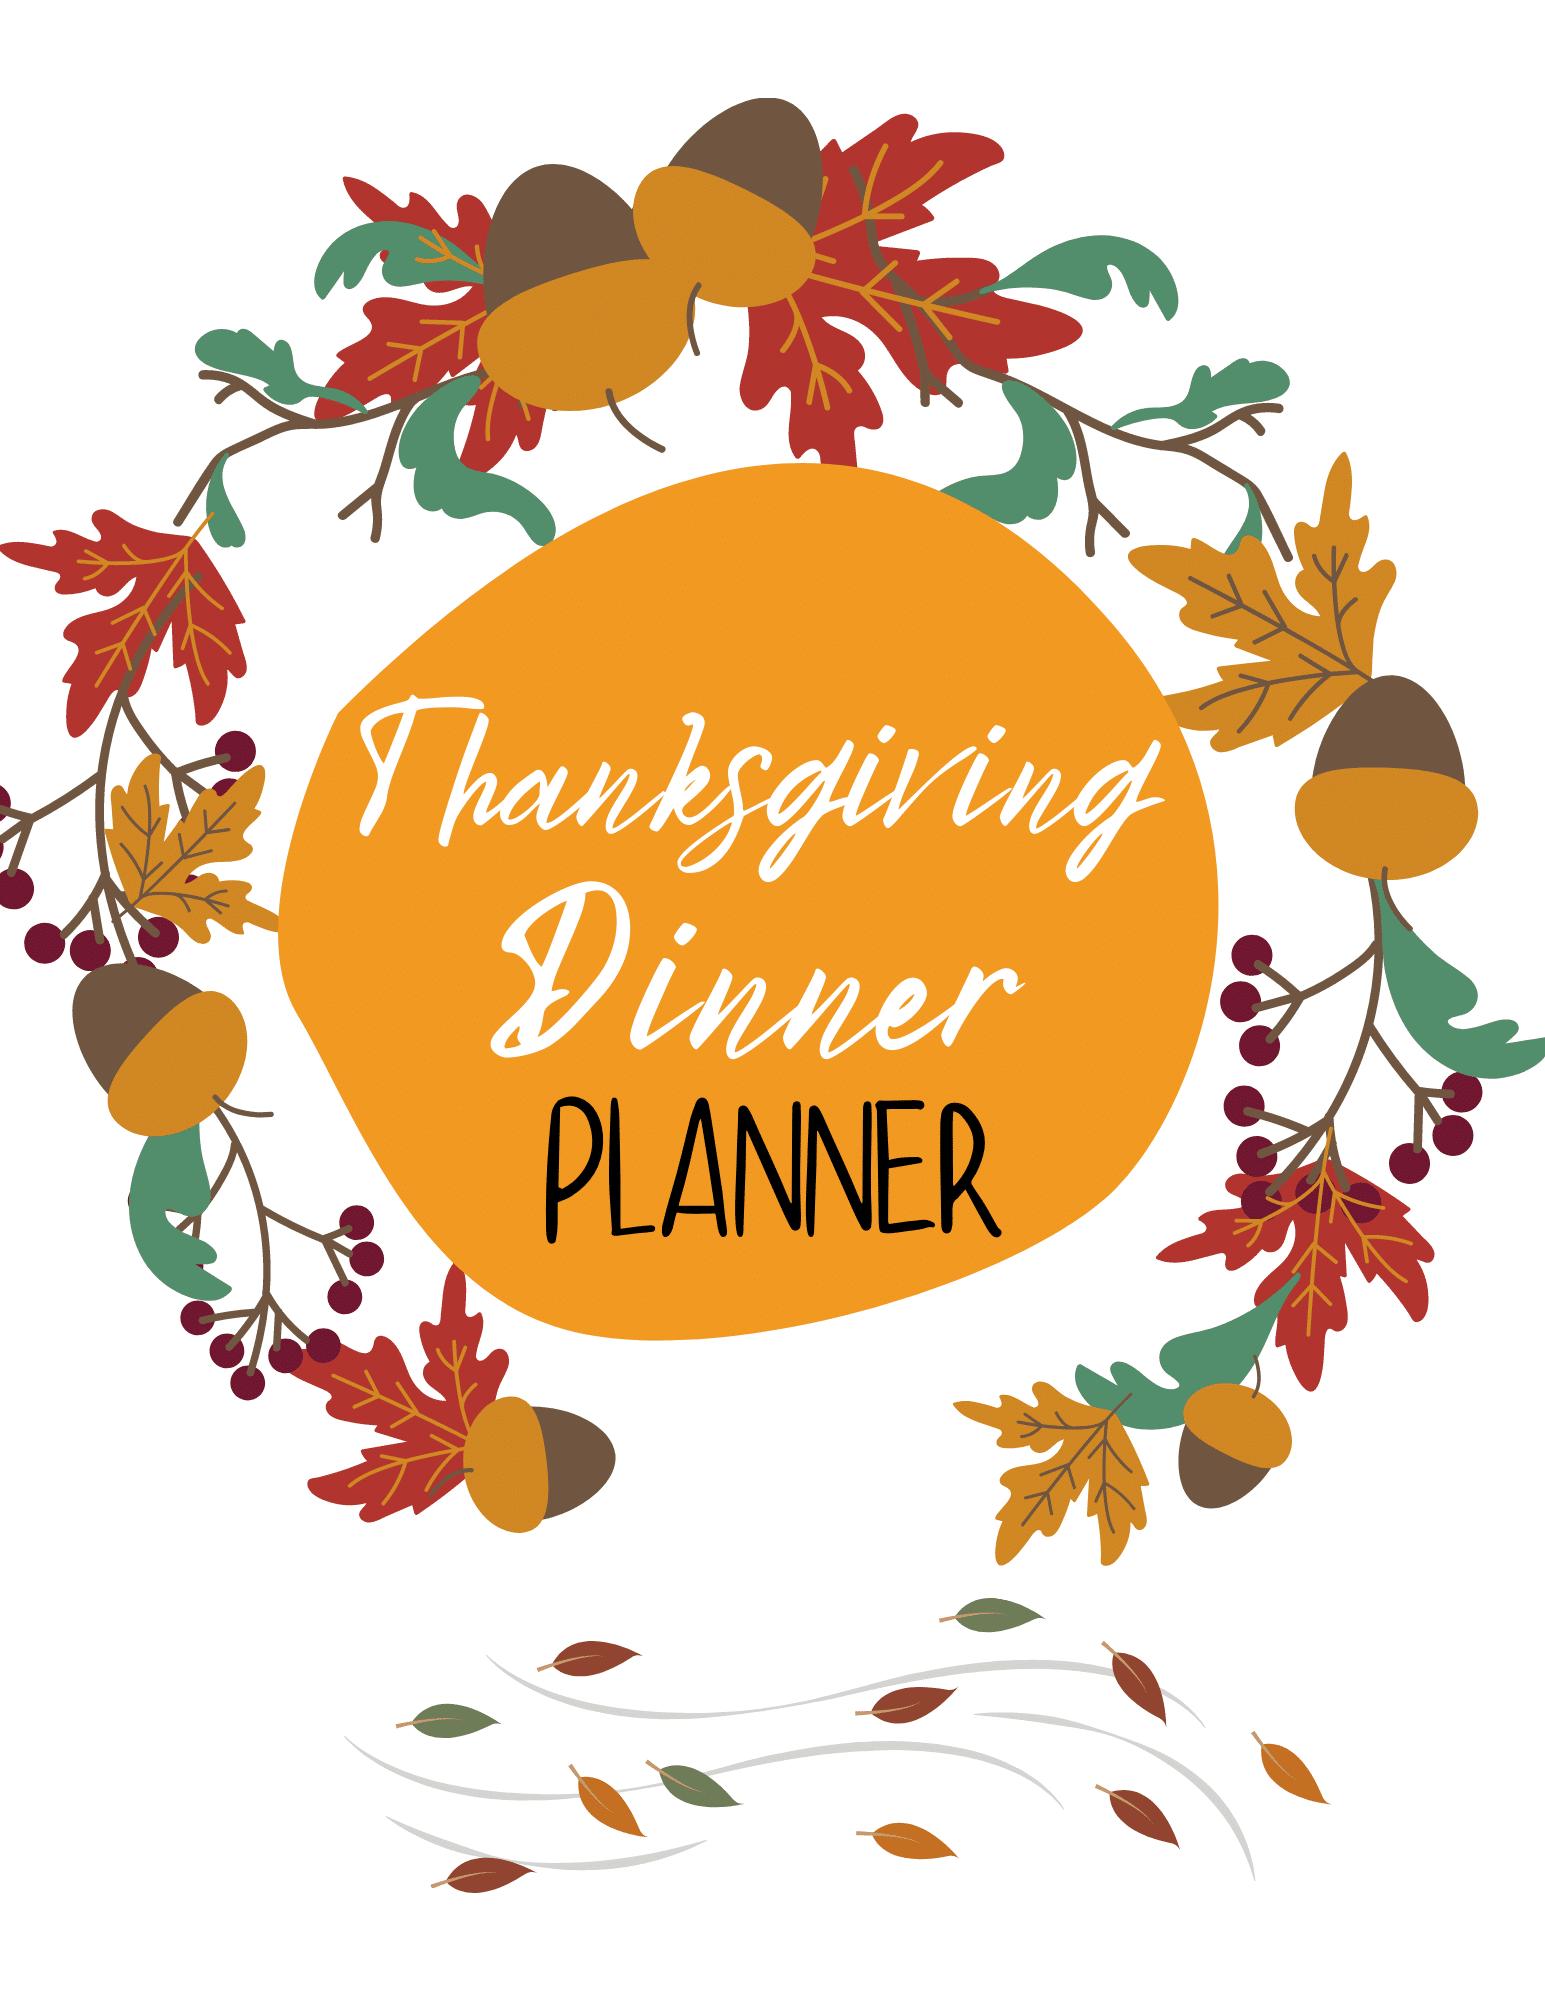 Printable Thanksgiving planner